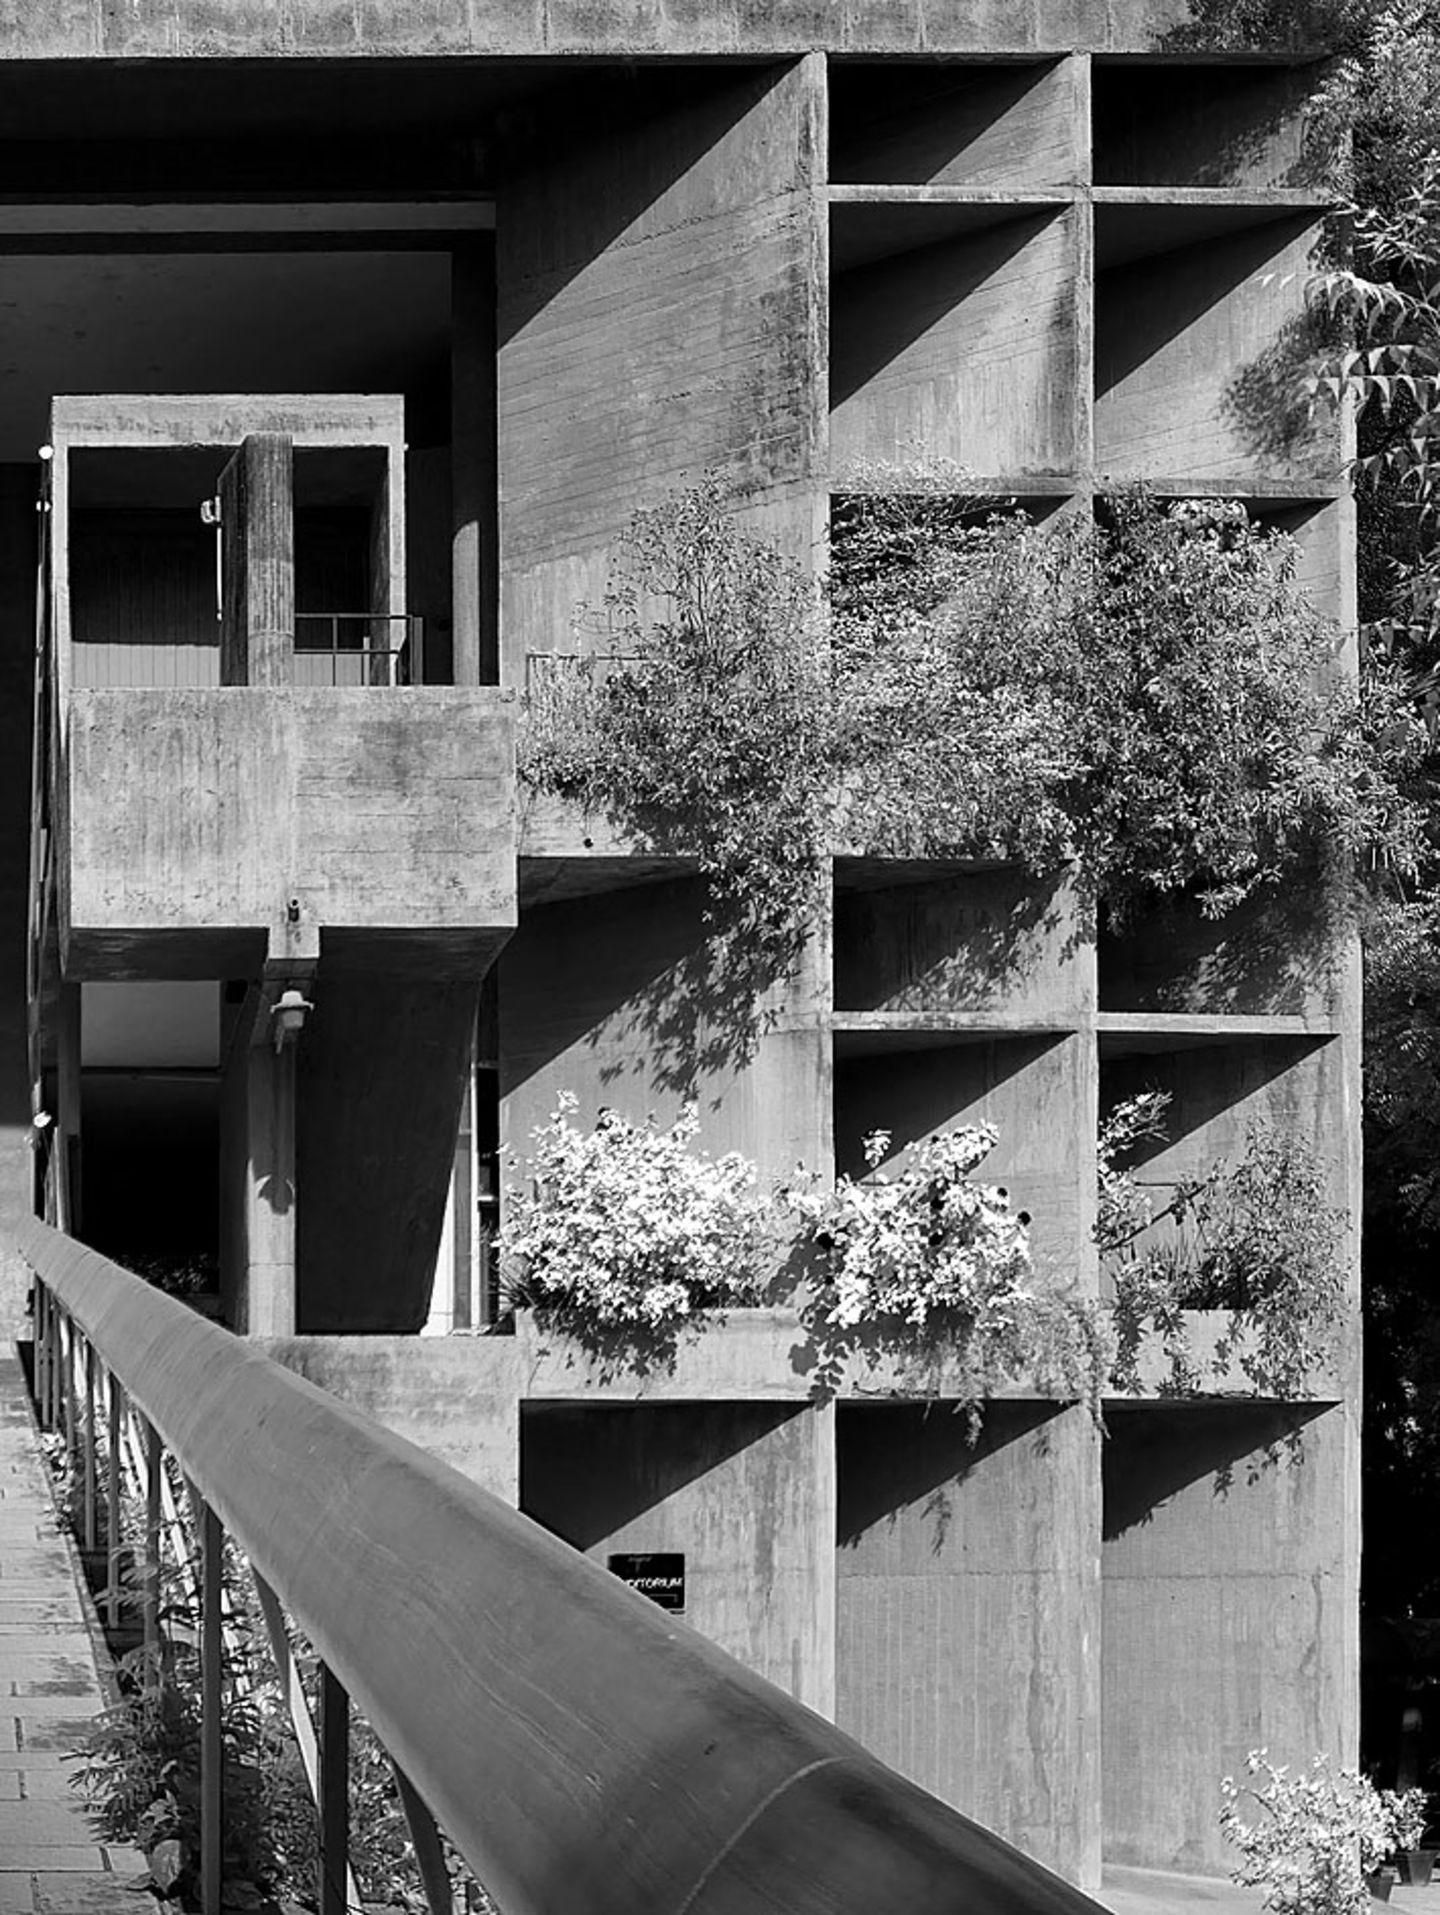 Millowners 12 always cool pinterest architektur moderne architektur bau - Beruhmte architektur ...